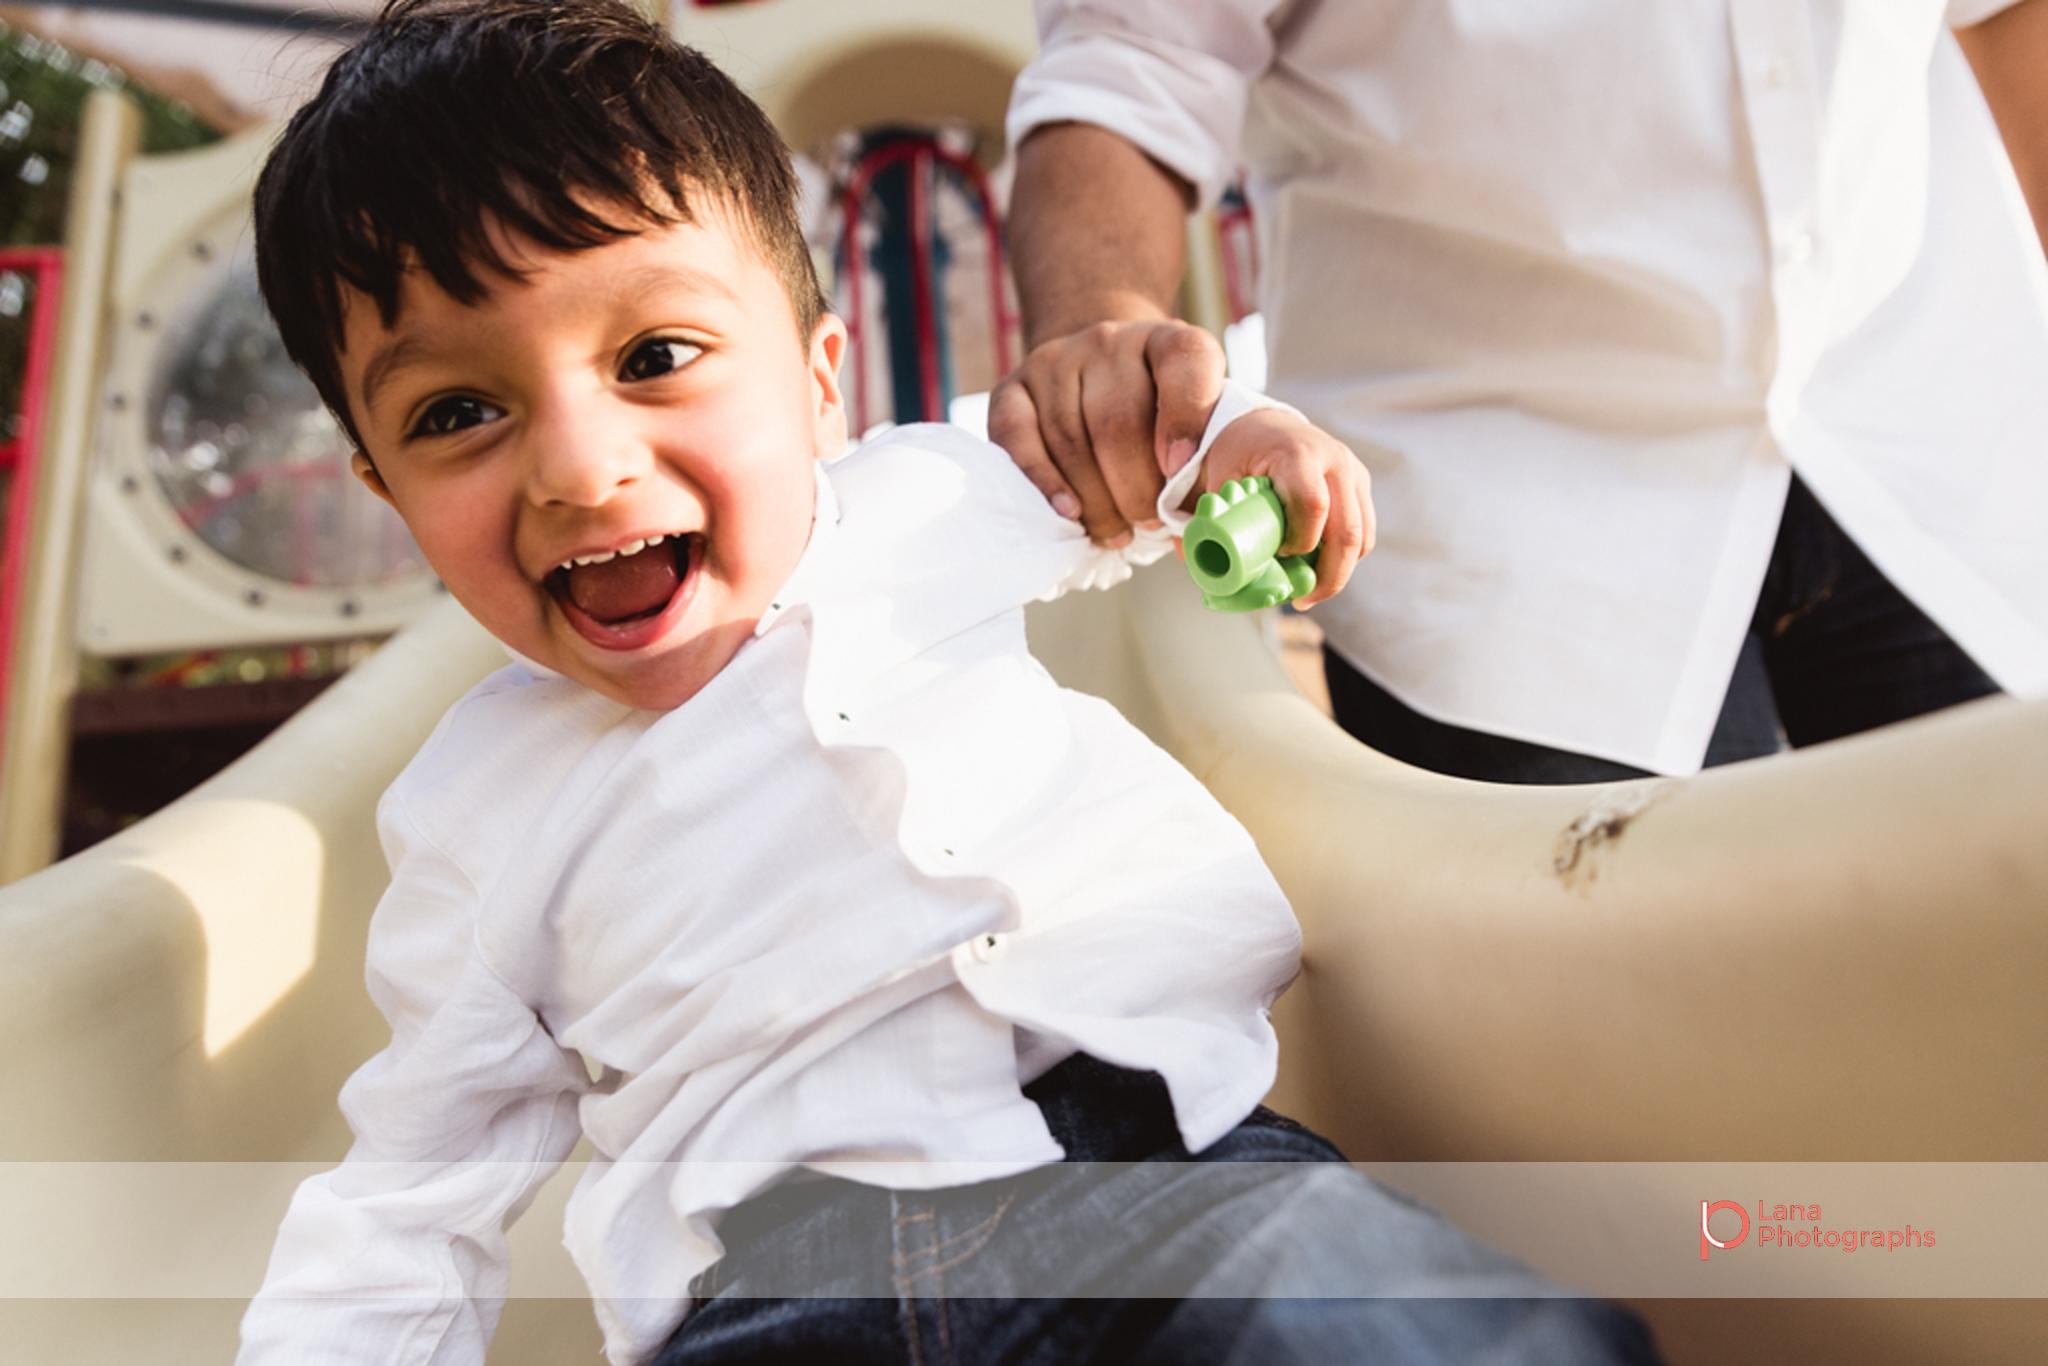 Lana Photographs Family Photographer Dubai Top Family Photographers baby boy sliding in the park